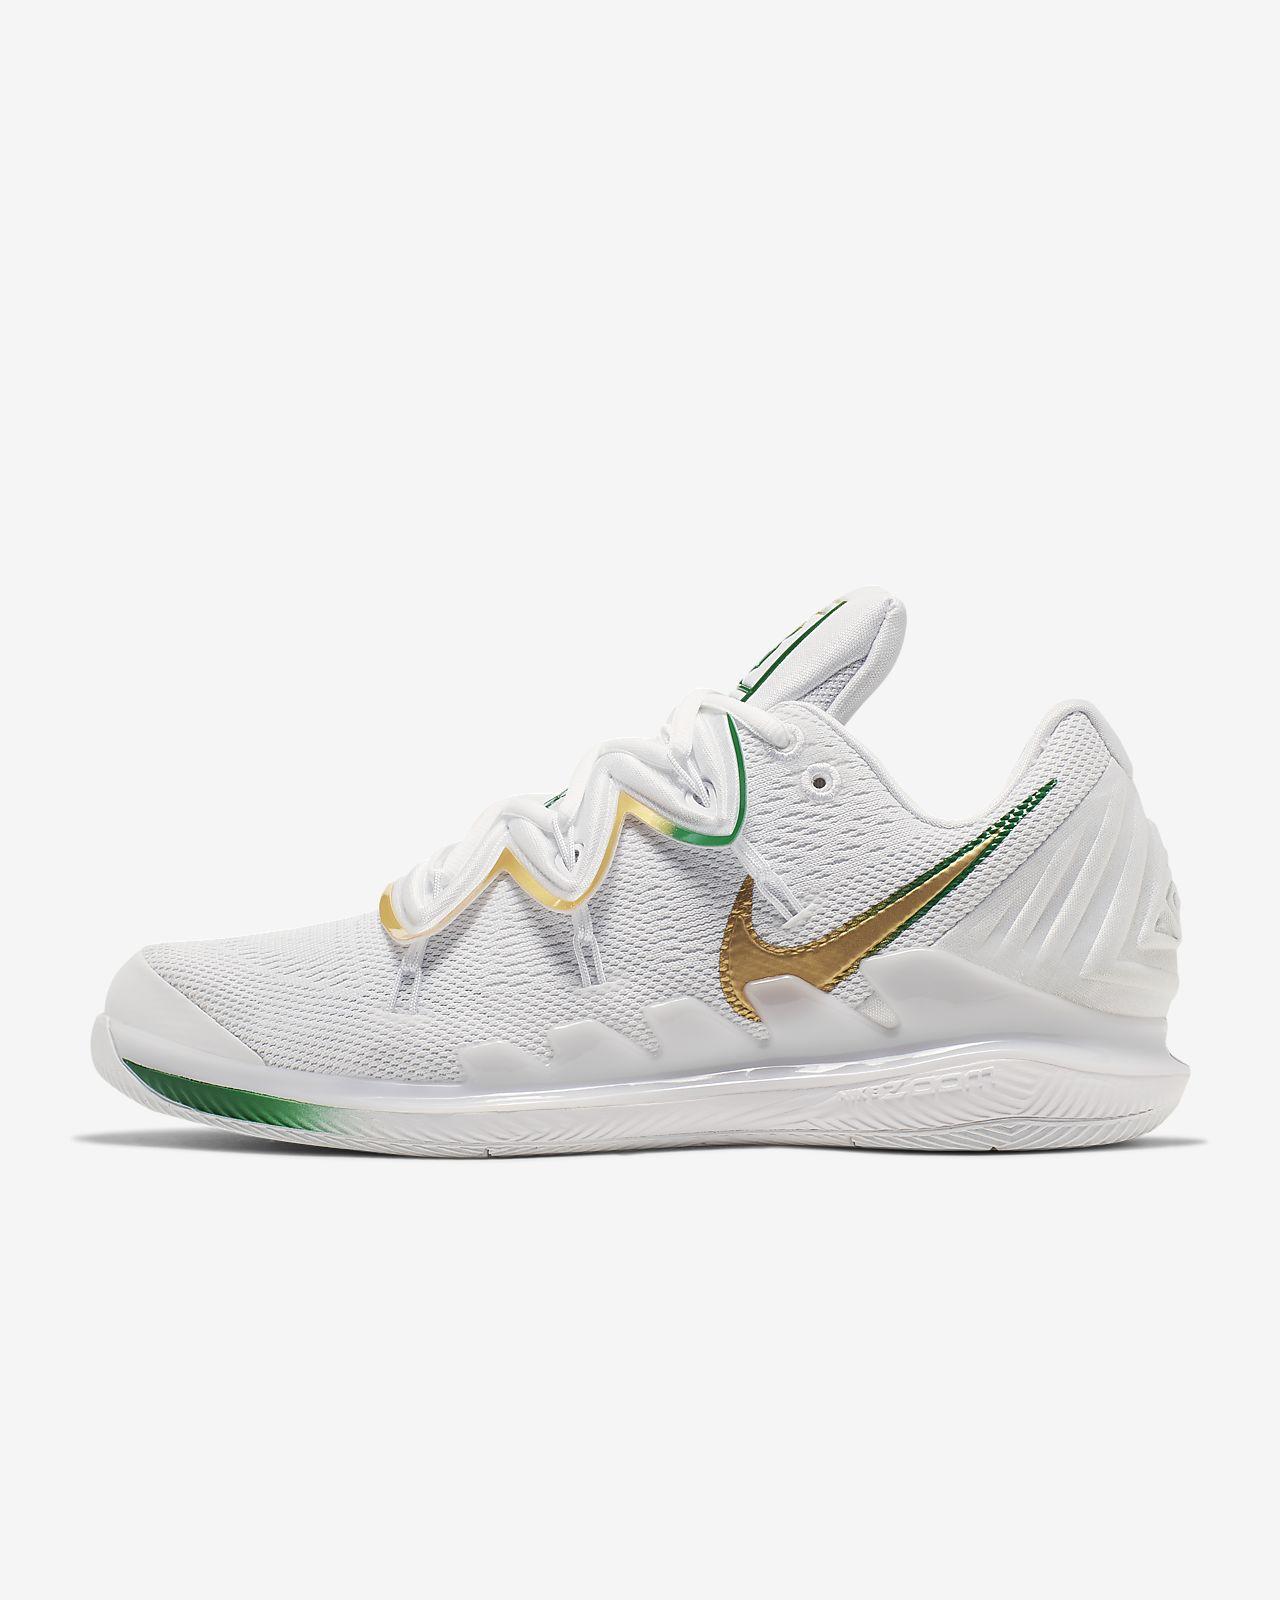 NikeCourt Air Zoom Vapor X Kyrie 5 Sabatilles per a pista ràpida de tennis - Home